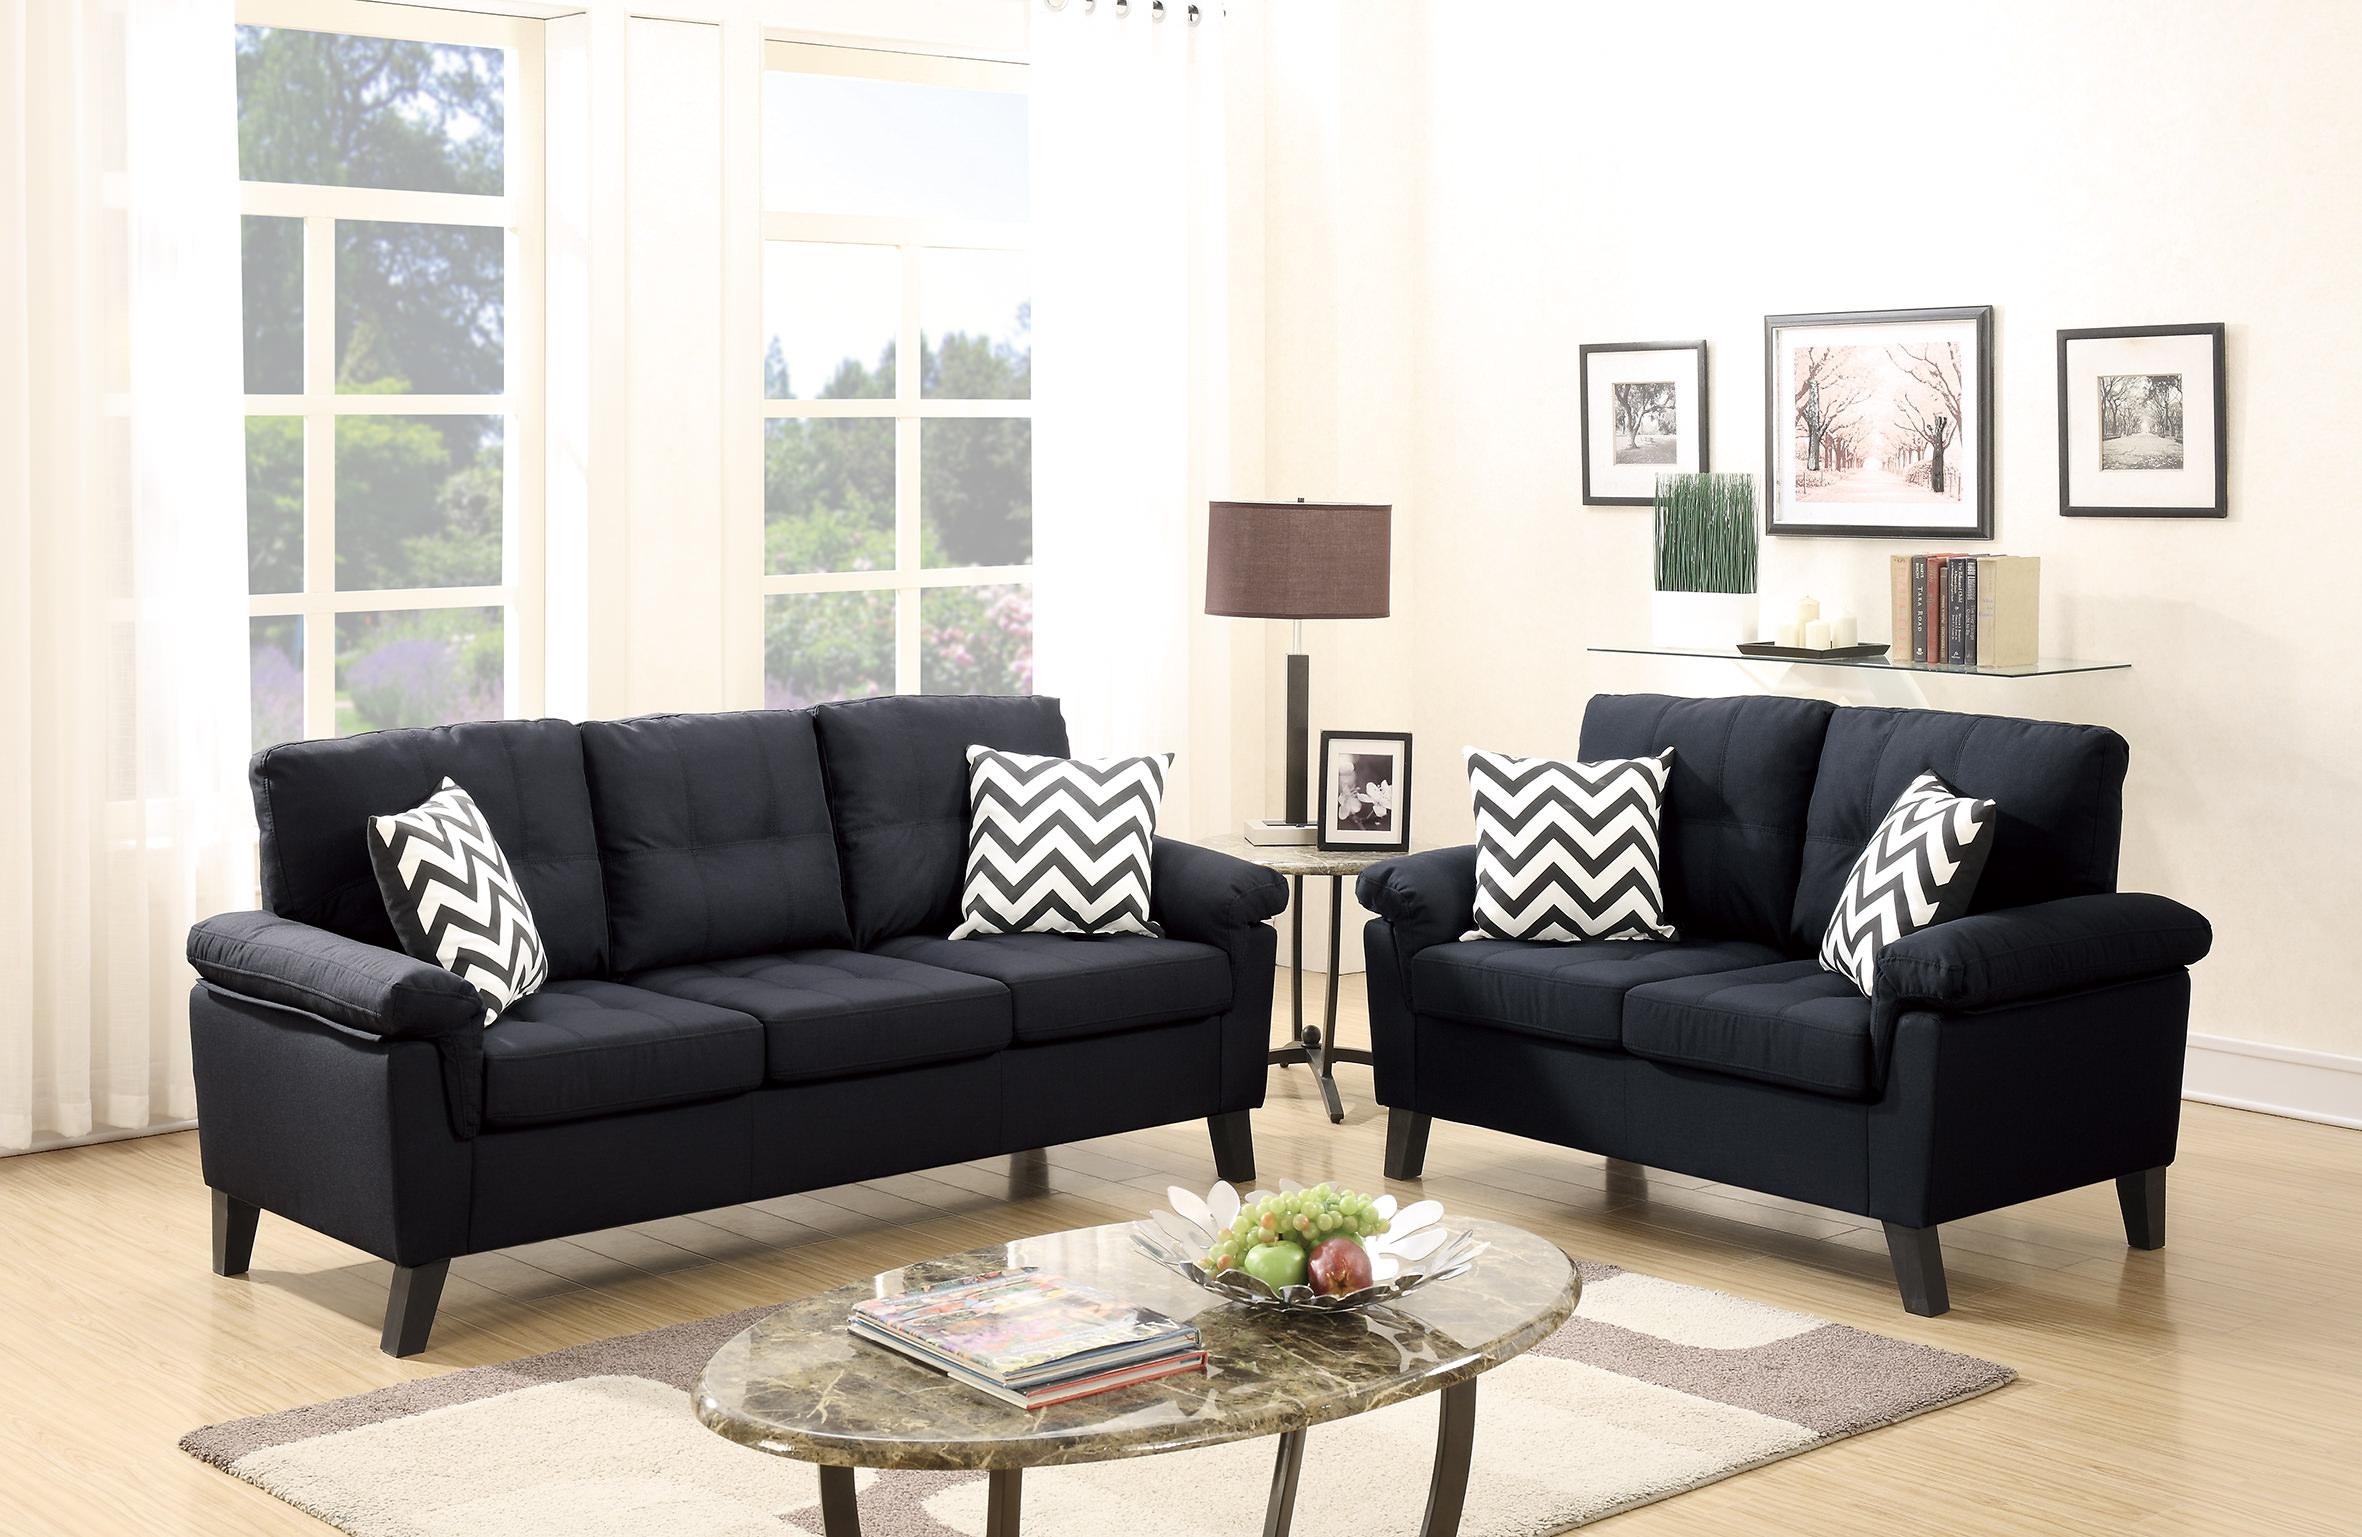 Super F6900 Black 2 Pcs Sofa Set By Poundex Creativecarmelina Interior Chair Design Creativecarmelinacom